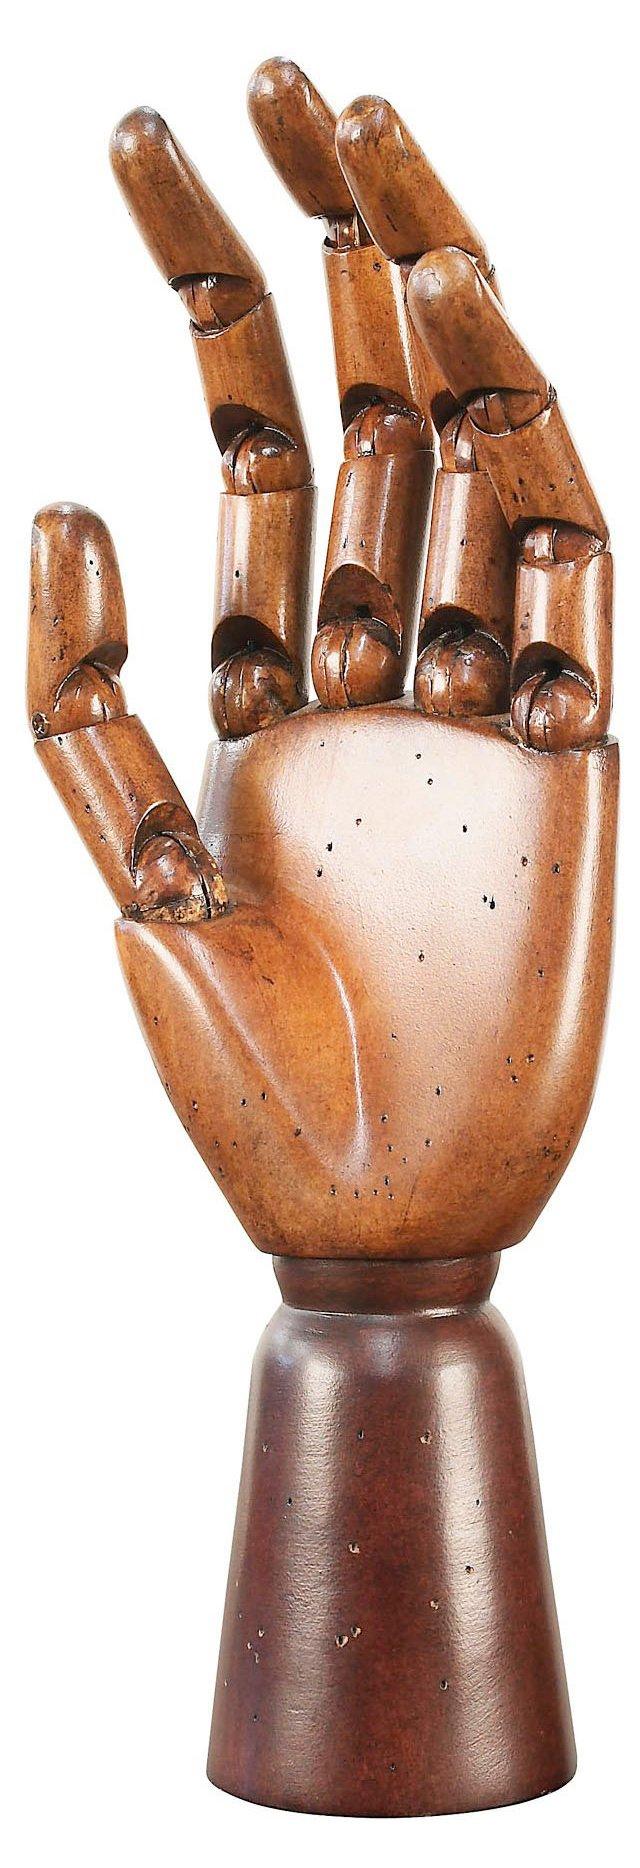 "10"" Art Hand Model, Brown"